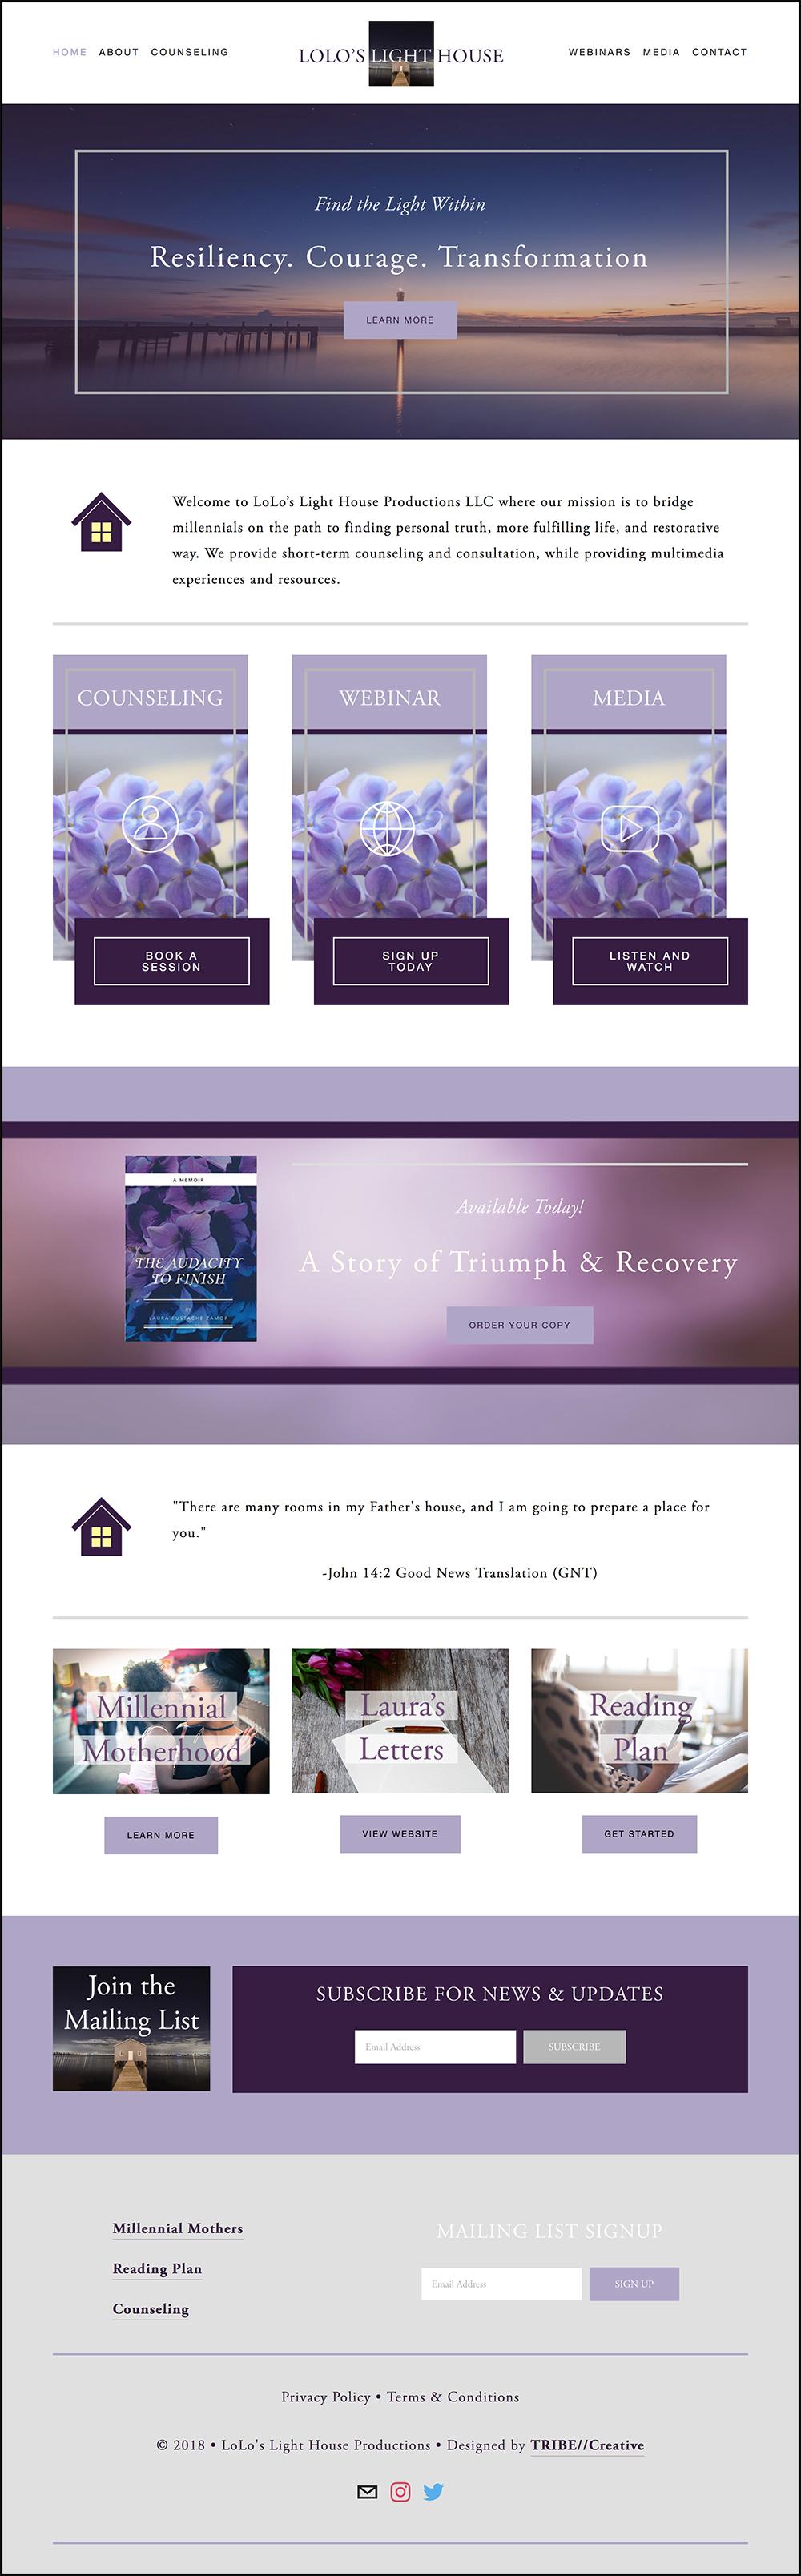 LLHproductionswebsite.jpg